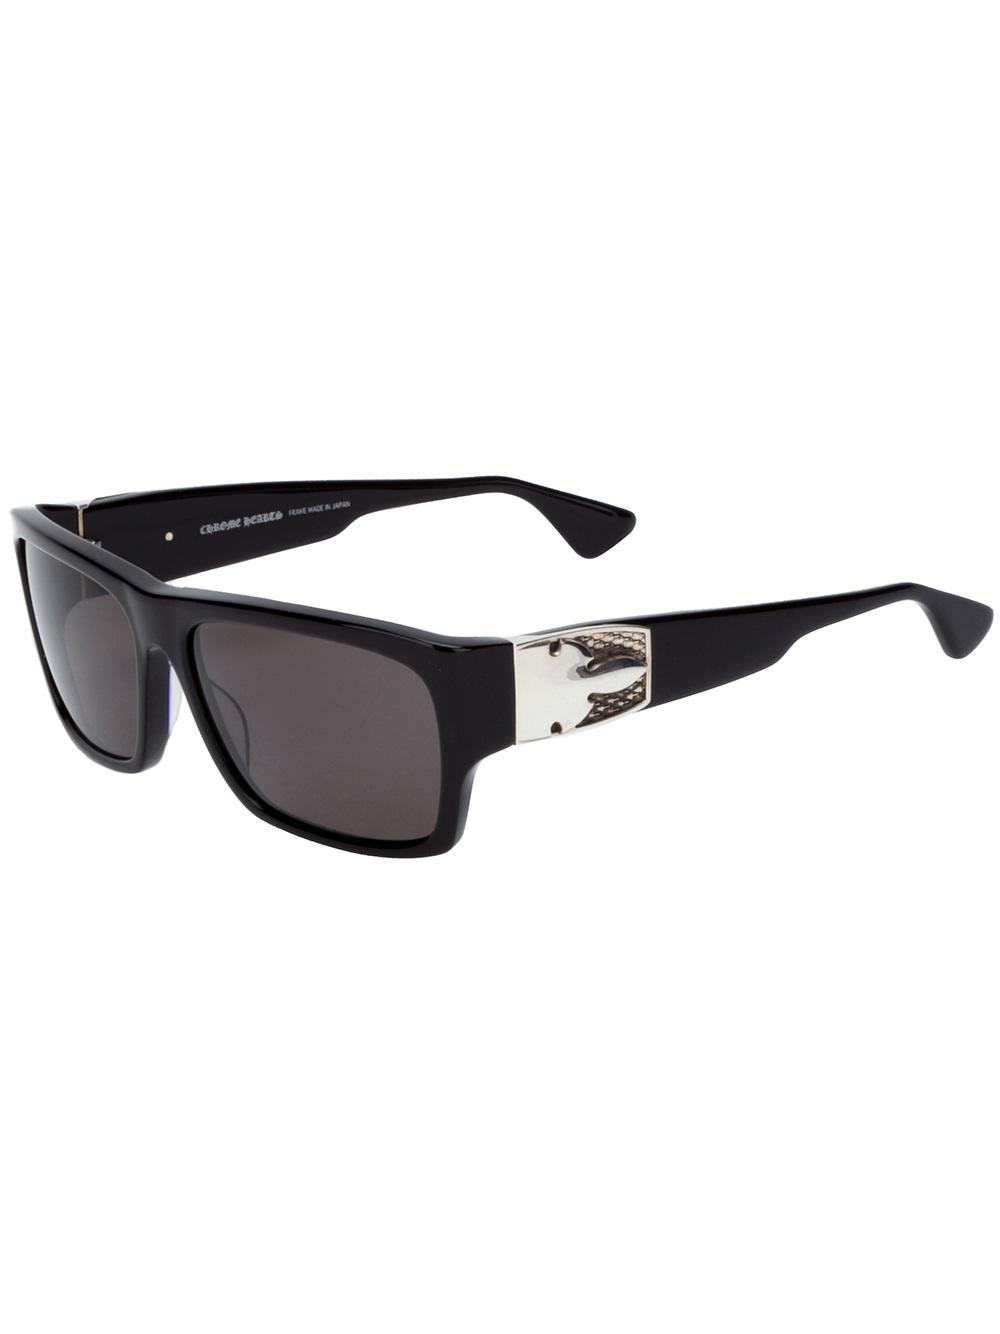 ebbc5524ccb Lyst - Chrome Hearts G Money Iv Sunglasses in Black